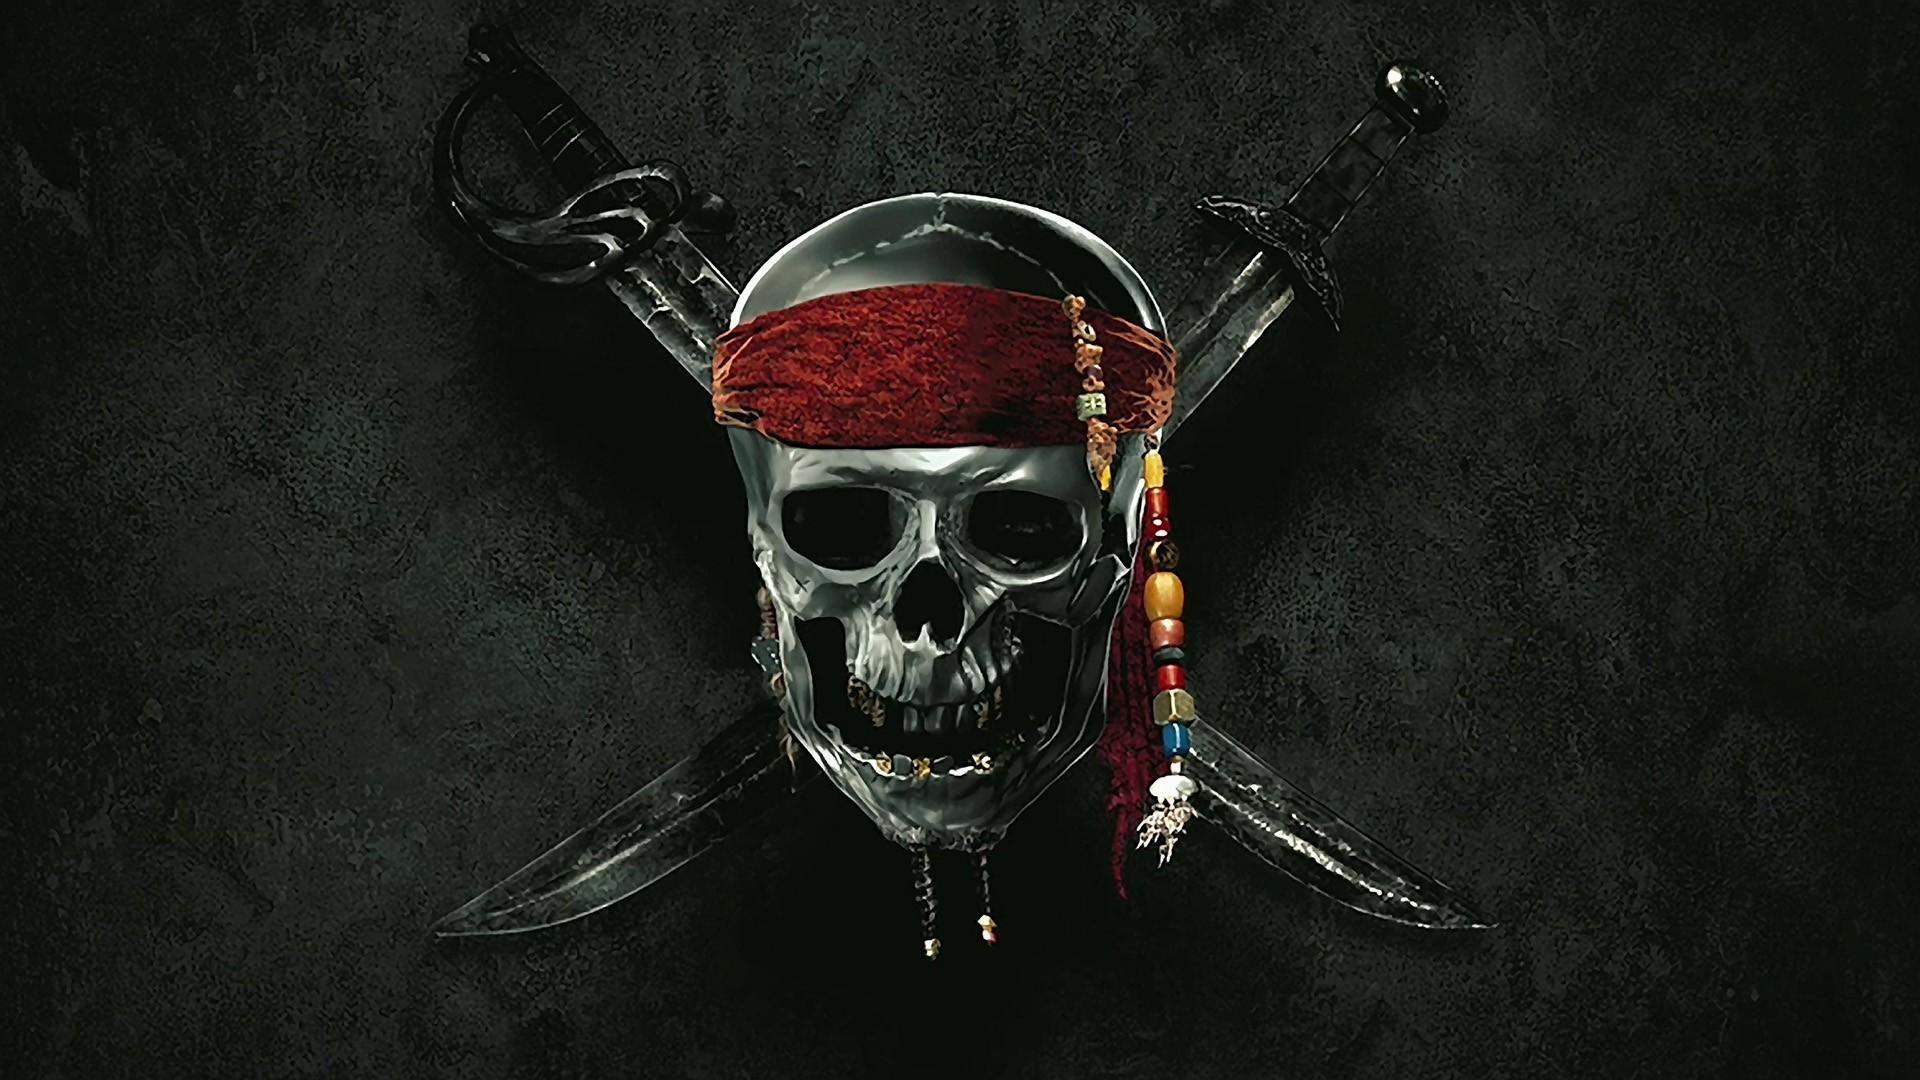 Death skull wallpaper, HD Desktop Wallpapers 2560×1440 Skull Wallpaper Hd  (53 Wallpapers